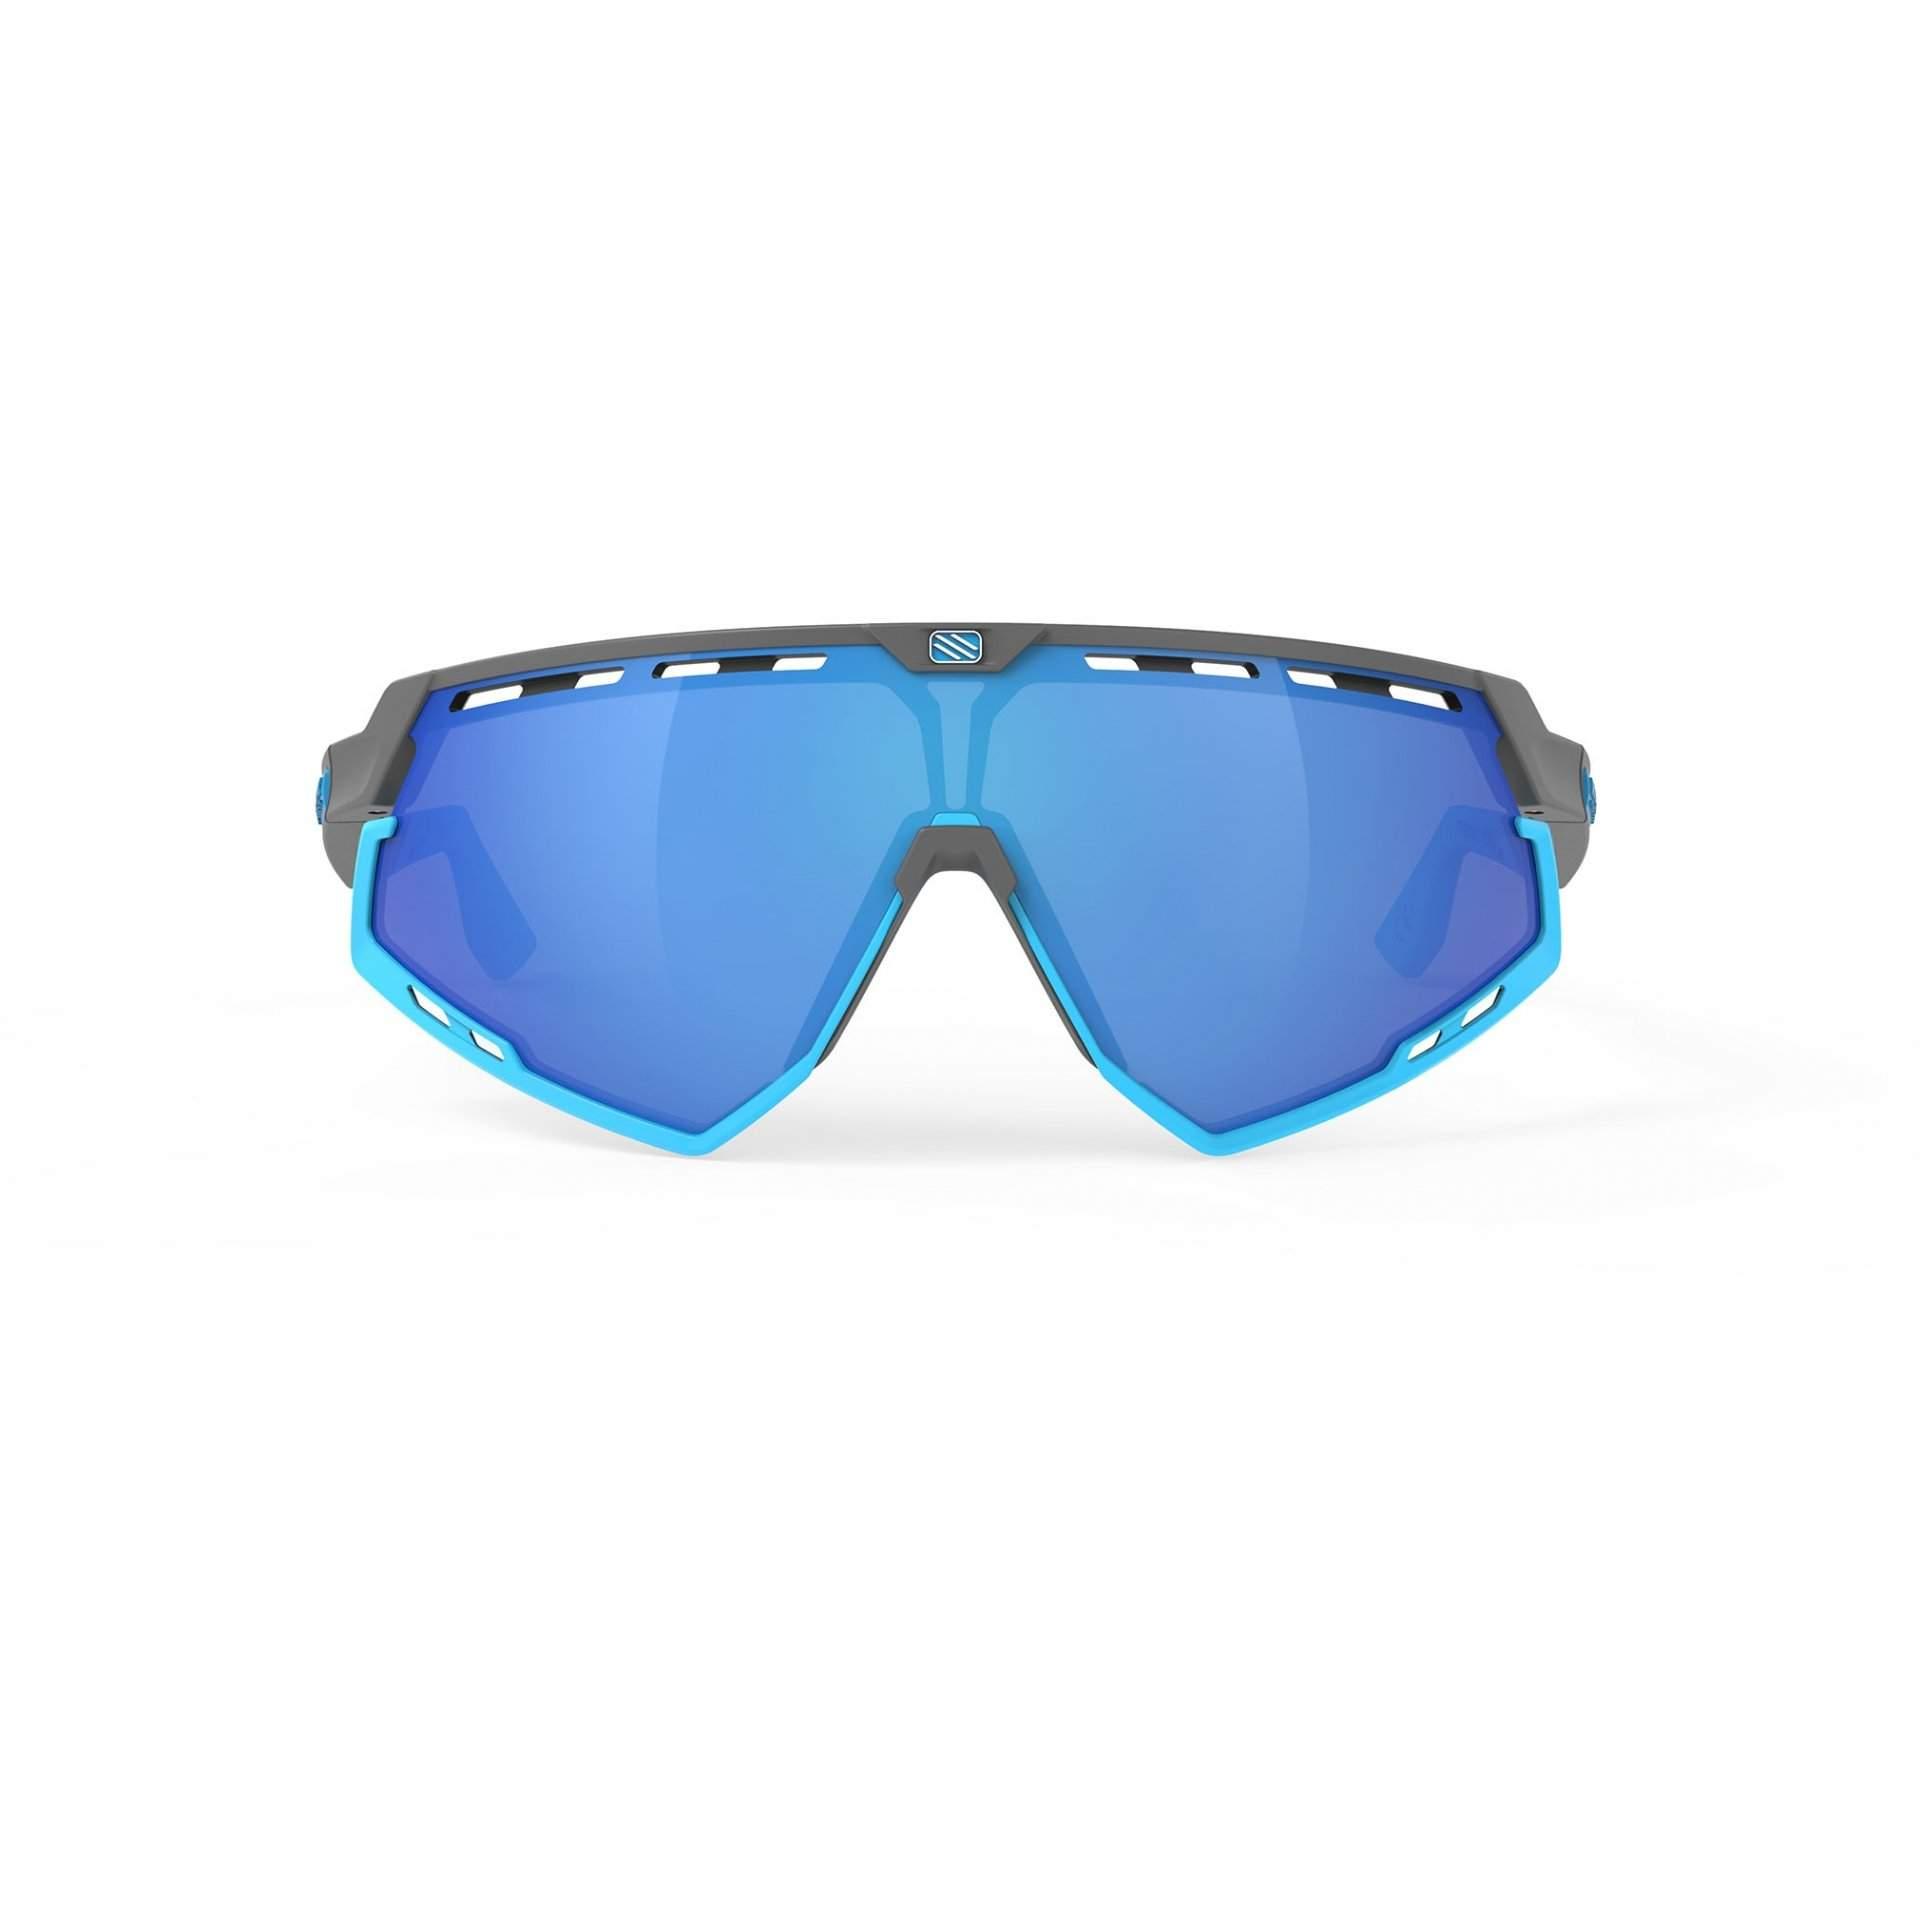 OKULARY RUDY PROJECT DEFENDER MULTILASER BLUE + GGREY|BUMPERS AZUR SP5239750002 Z PRZODU